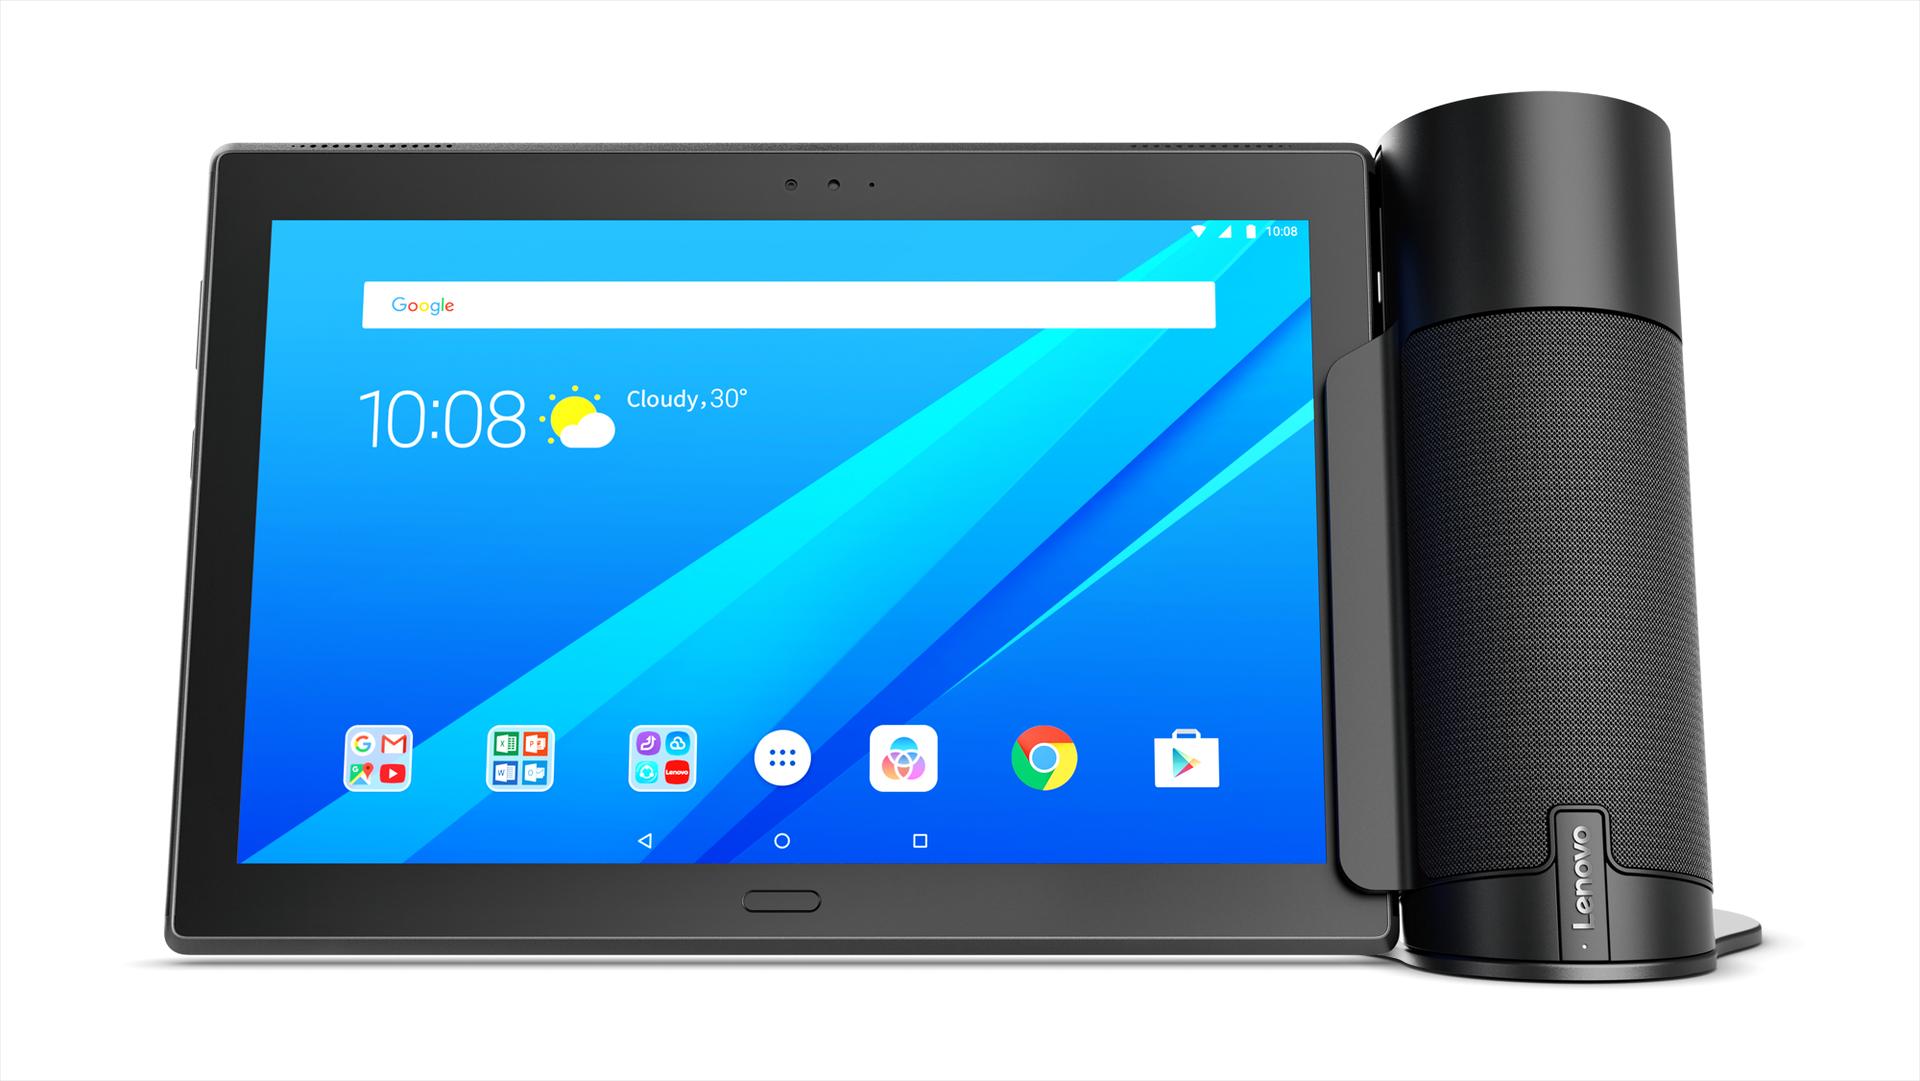 Alexa und Google Assistant: Der Wettkampf smarter Lautsprecher verändert sich - Home Assistant (Bild: Lenovo)